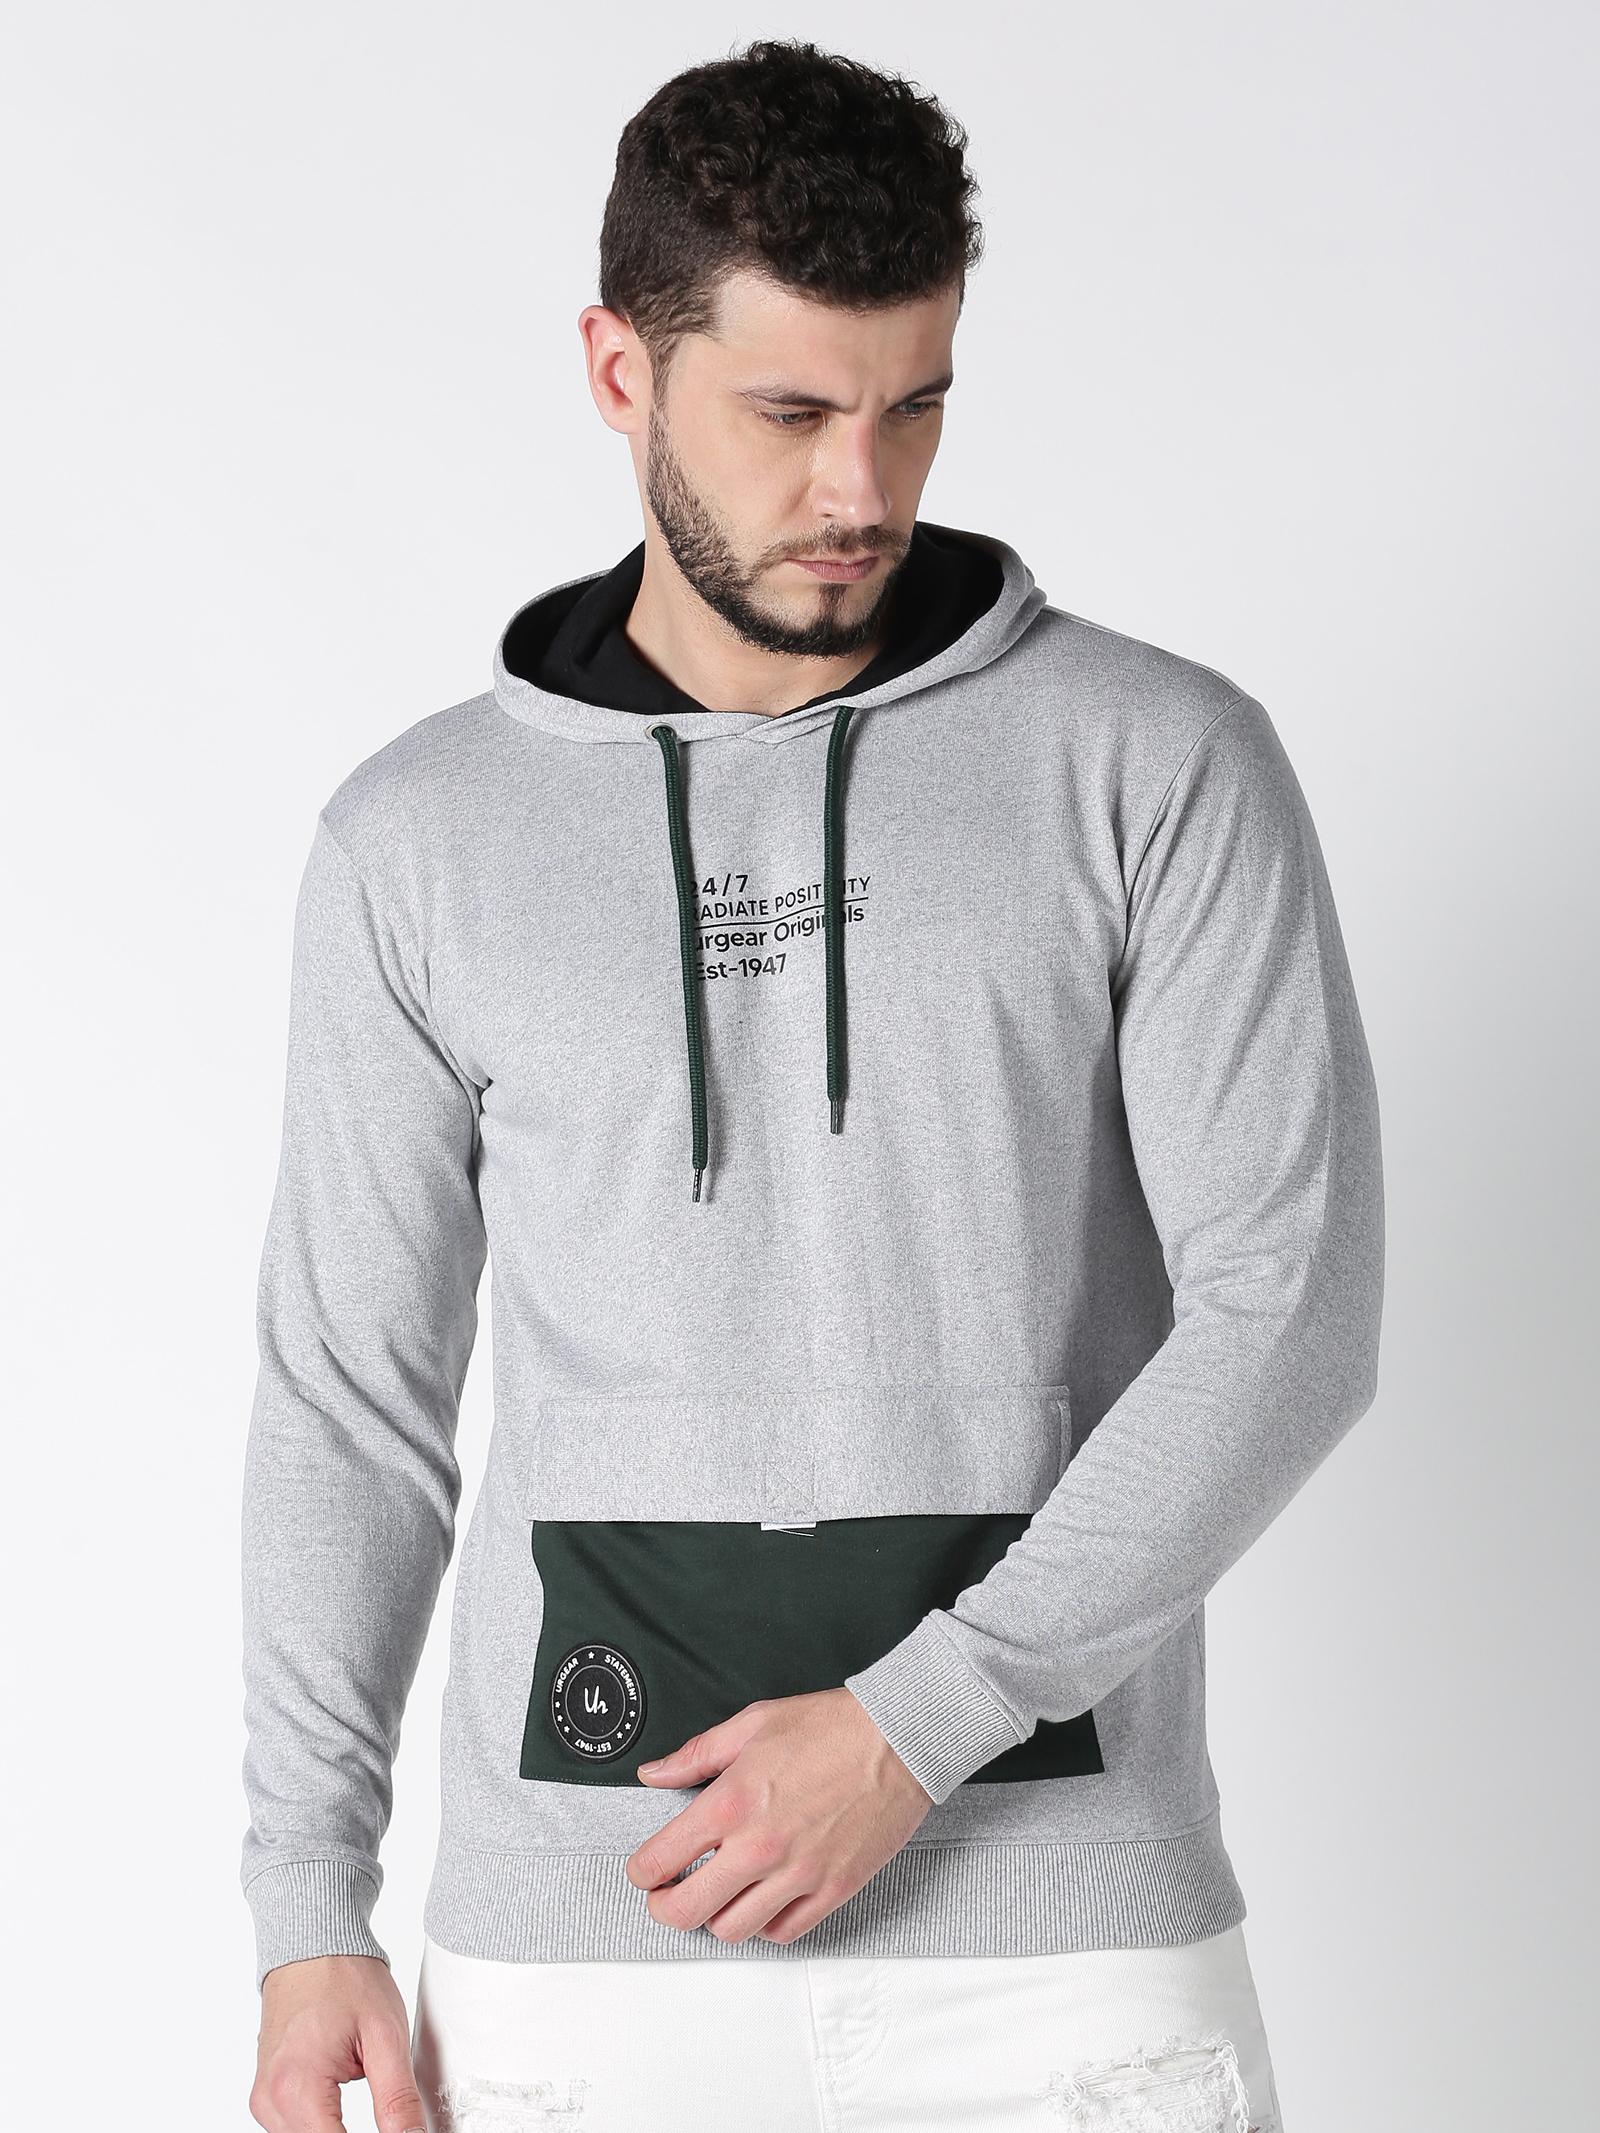 UrGear | Urgear Colourblock Hooded Neck Green & Grey Sweatshirt